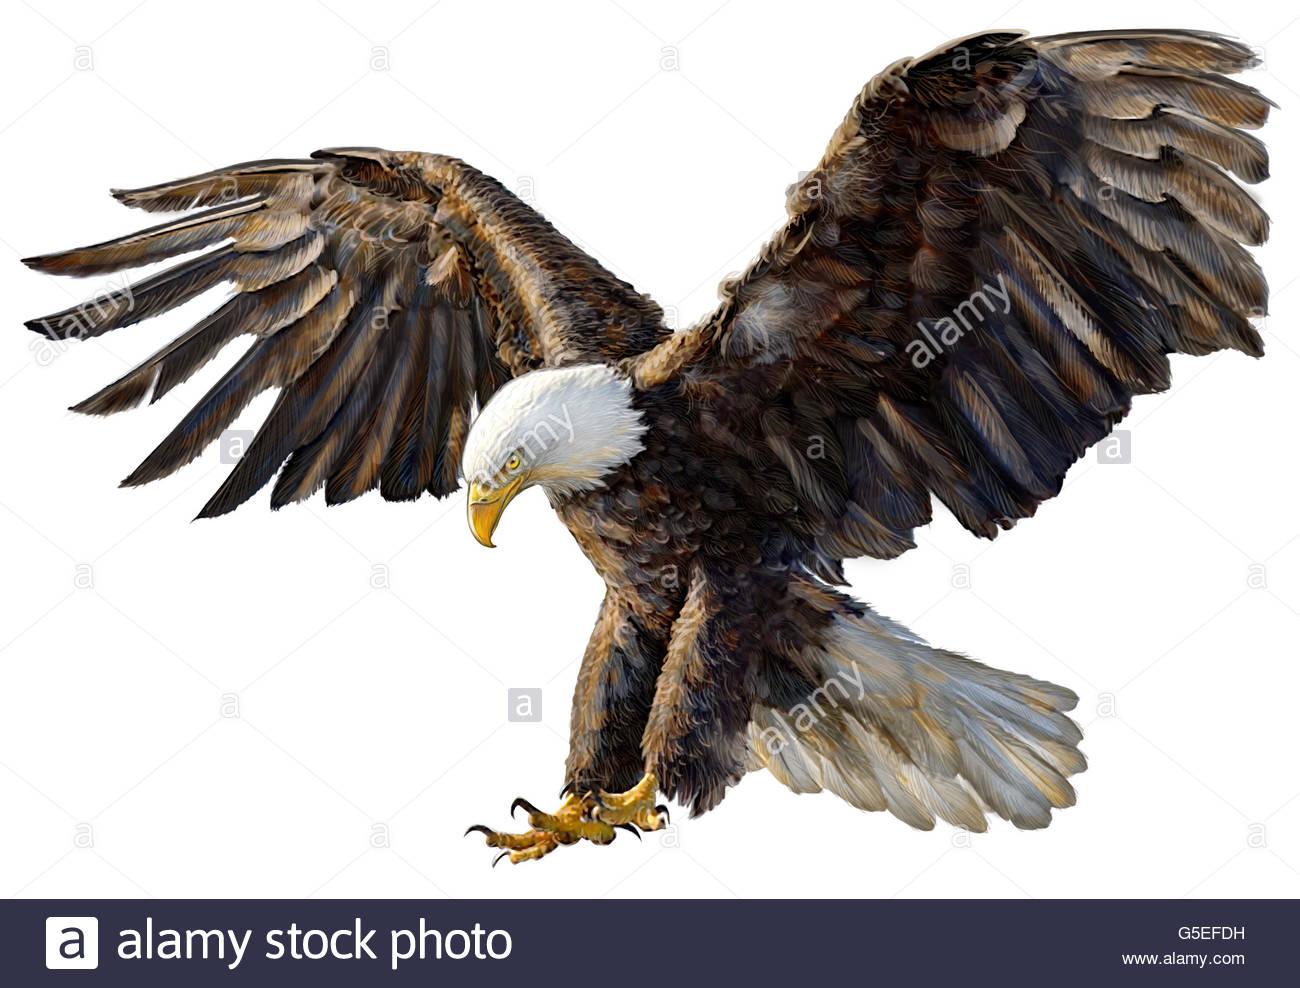 1300x988 Animal, Wildlife, Bird, Bale Eagle, American Eagle, Isolated Stock